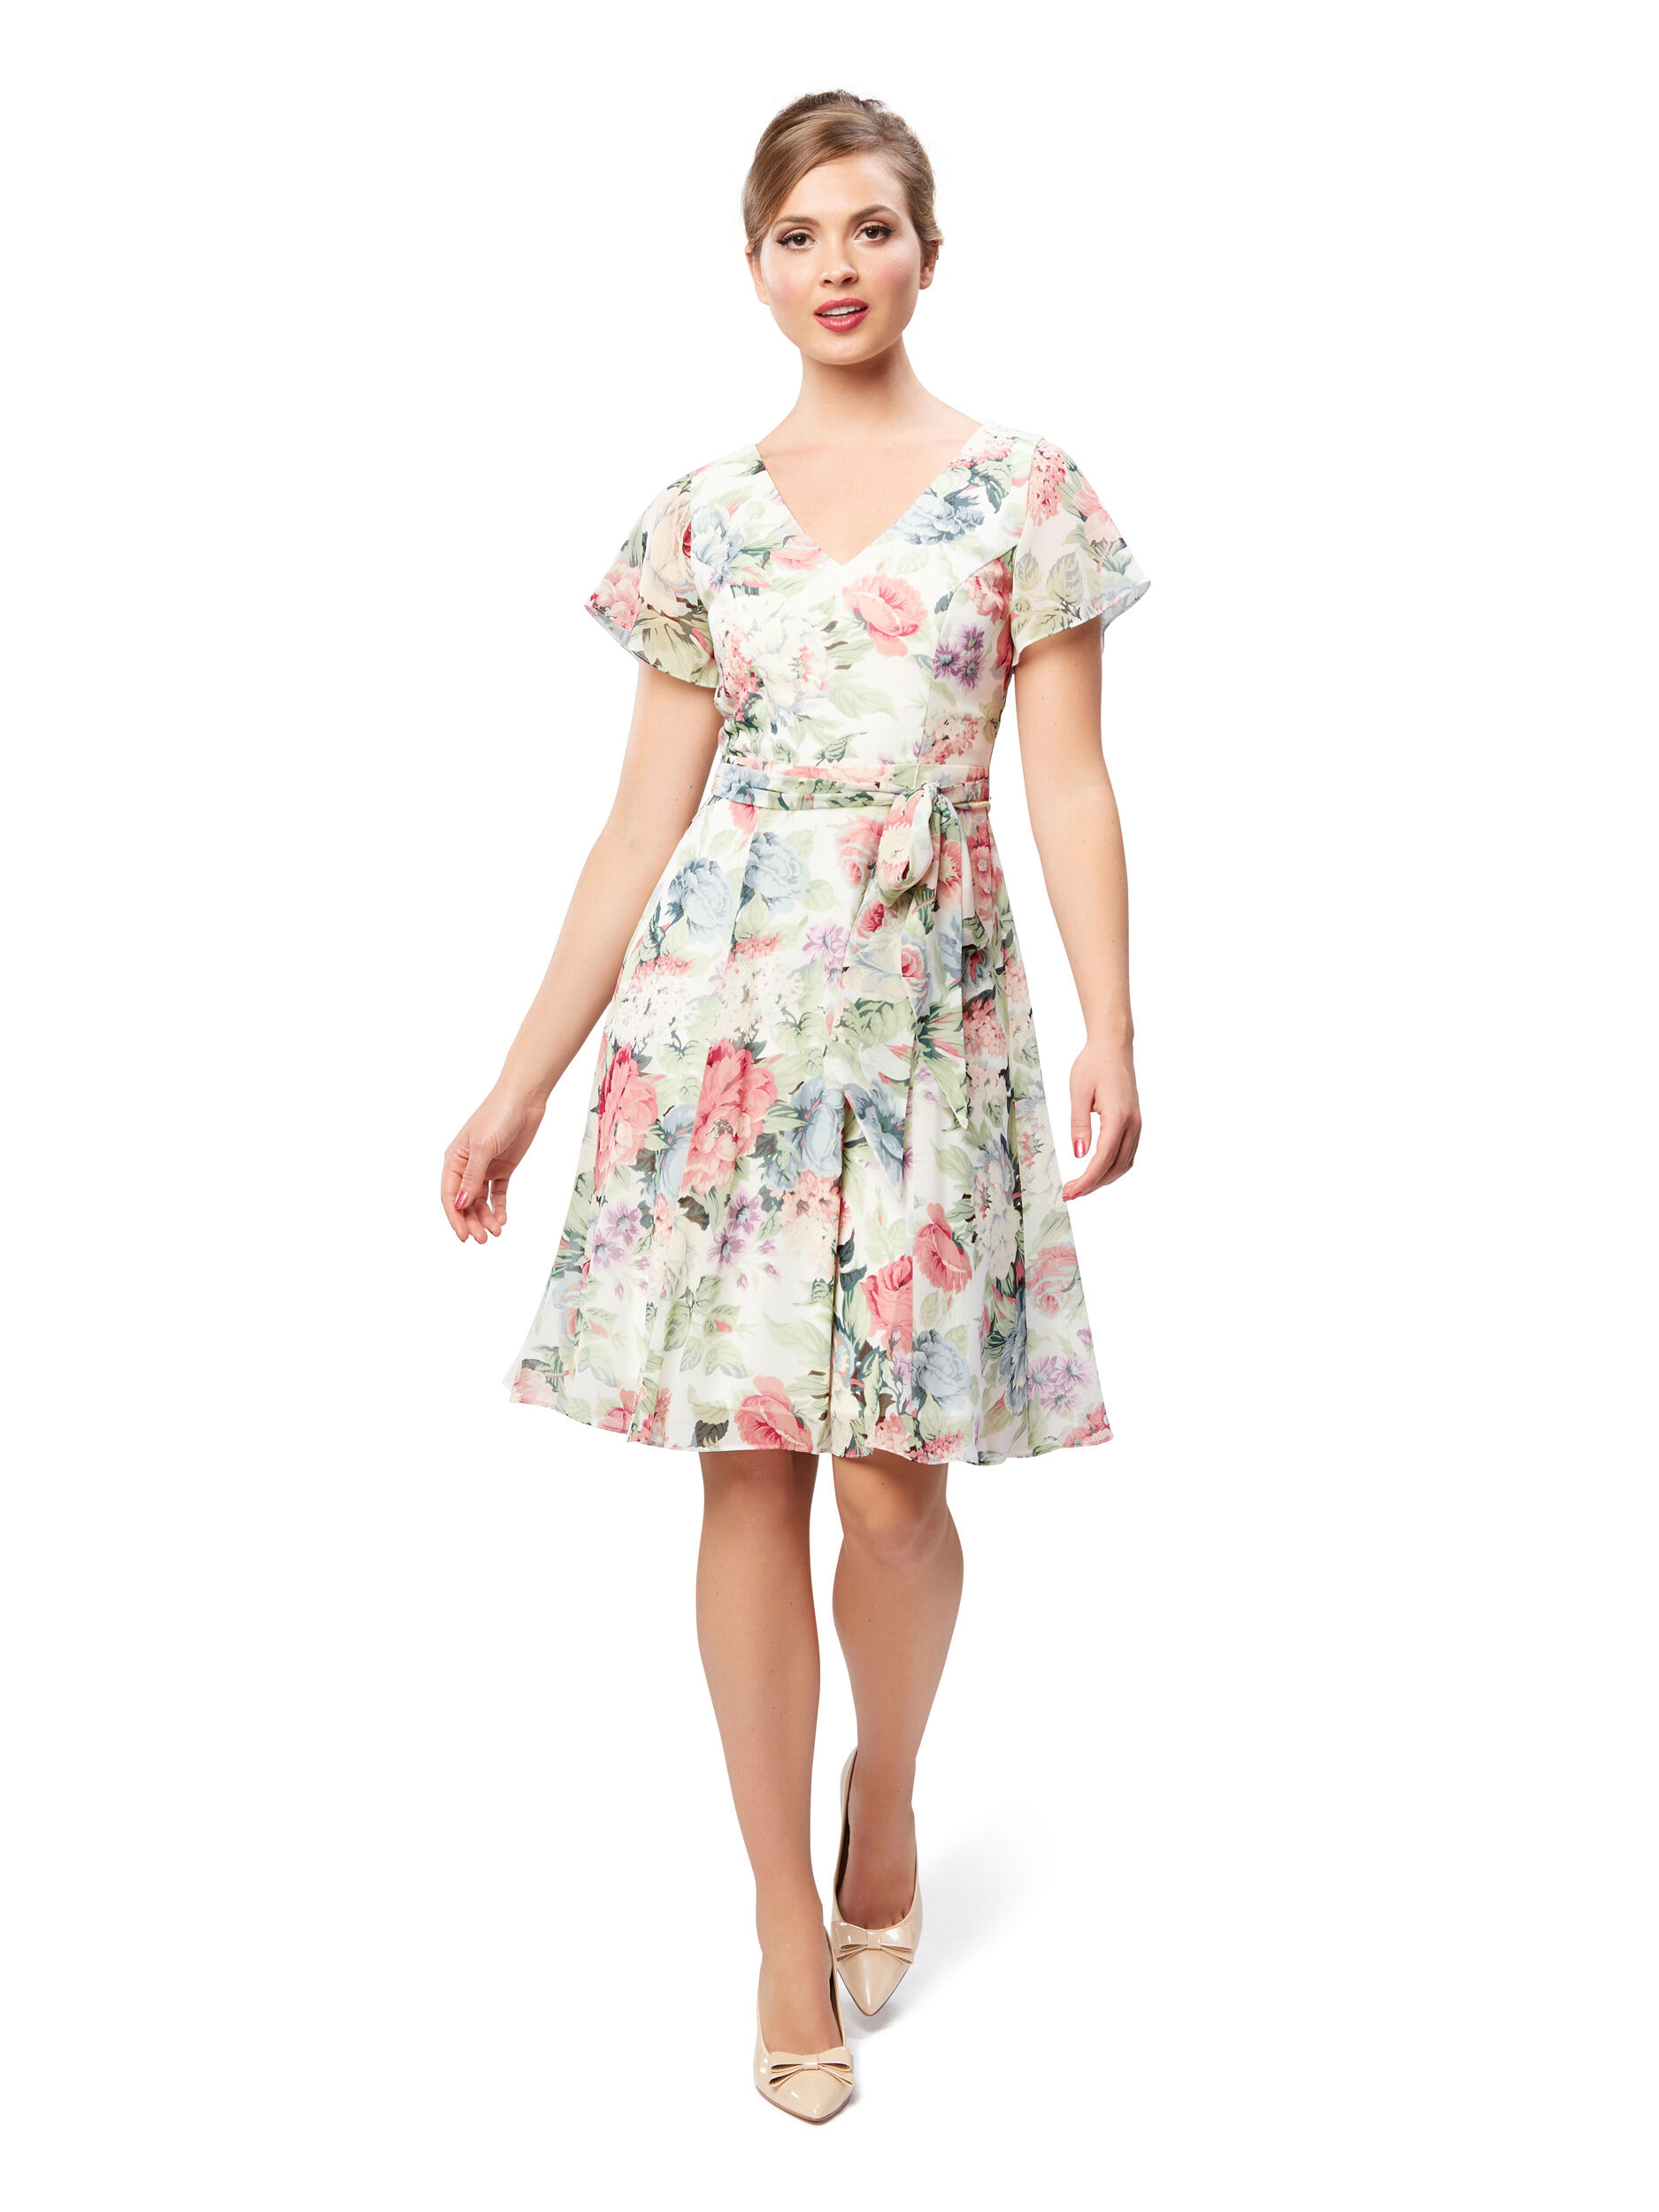 Plantation Floral Dress